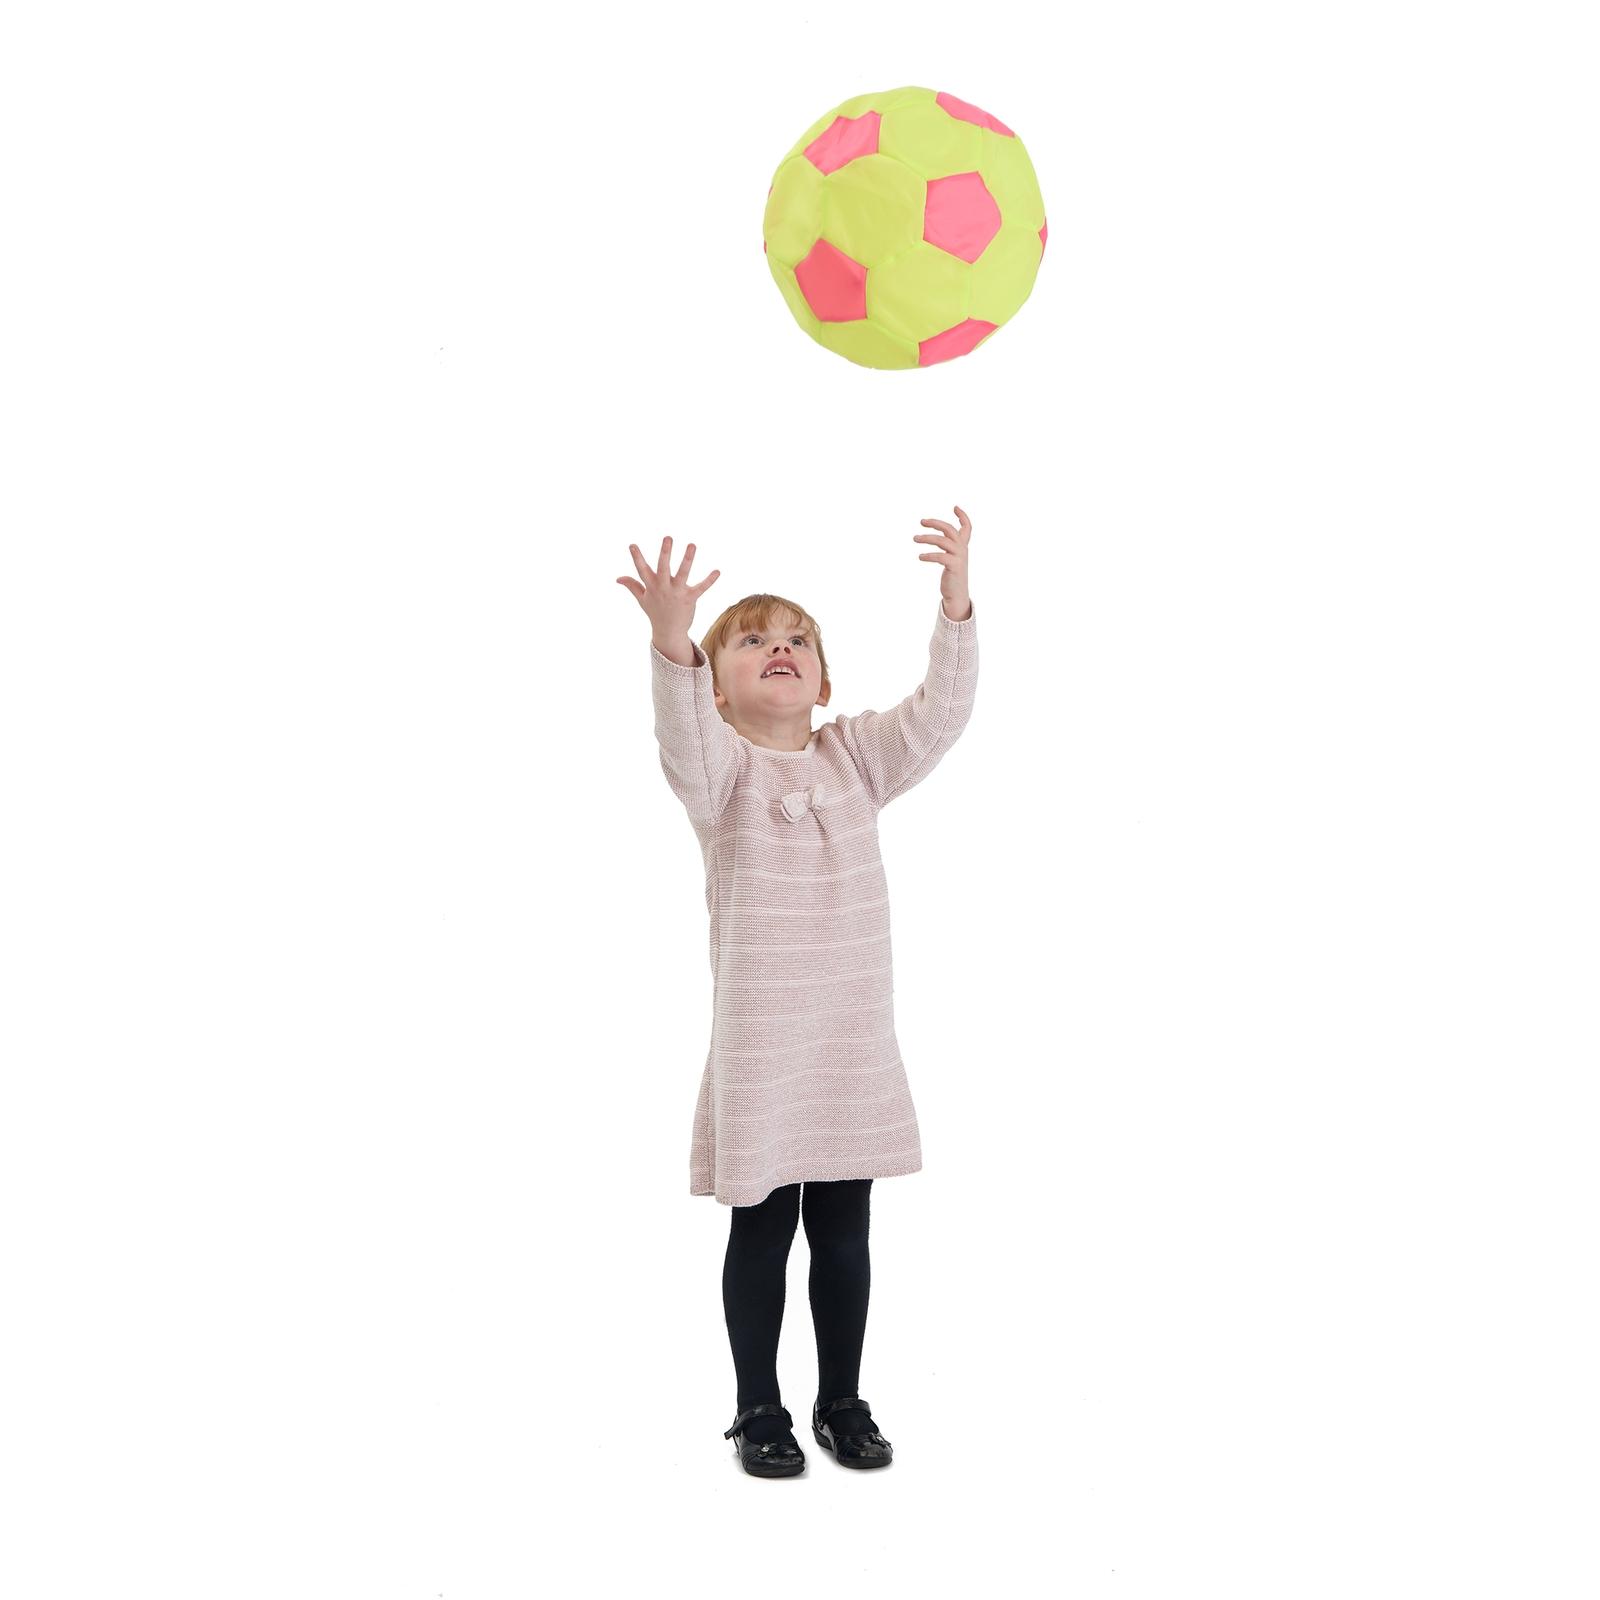 Fun Soccer Ball